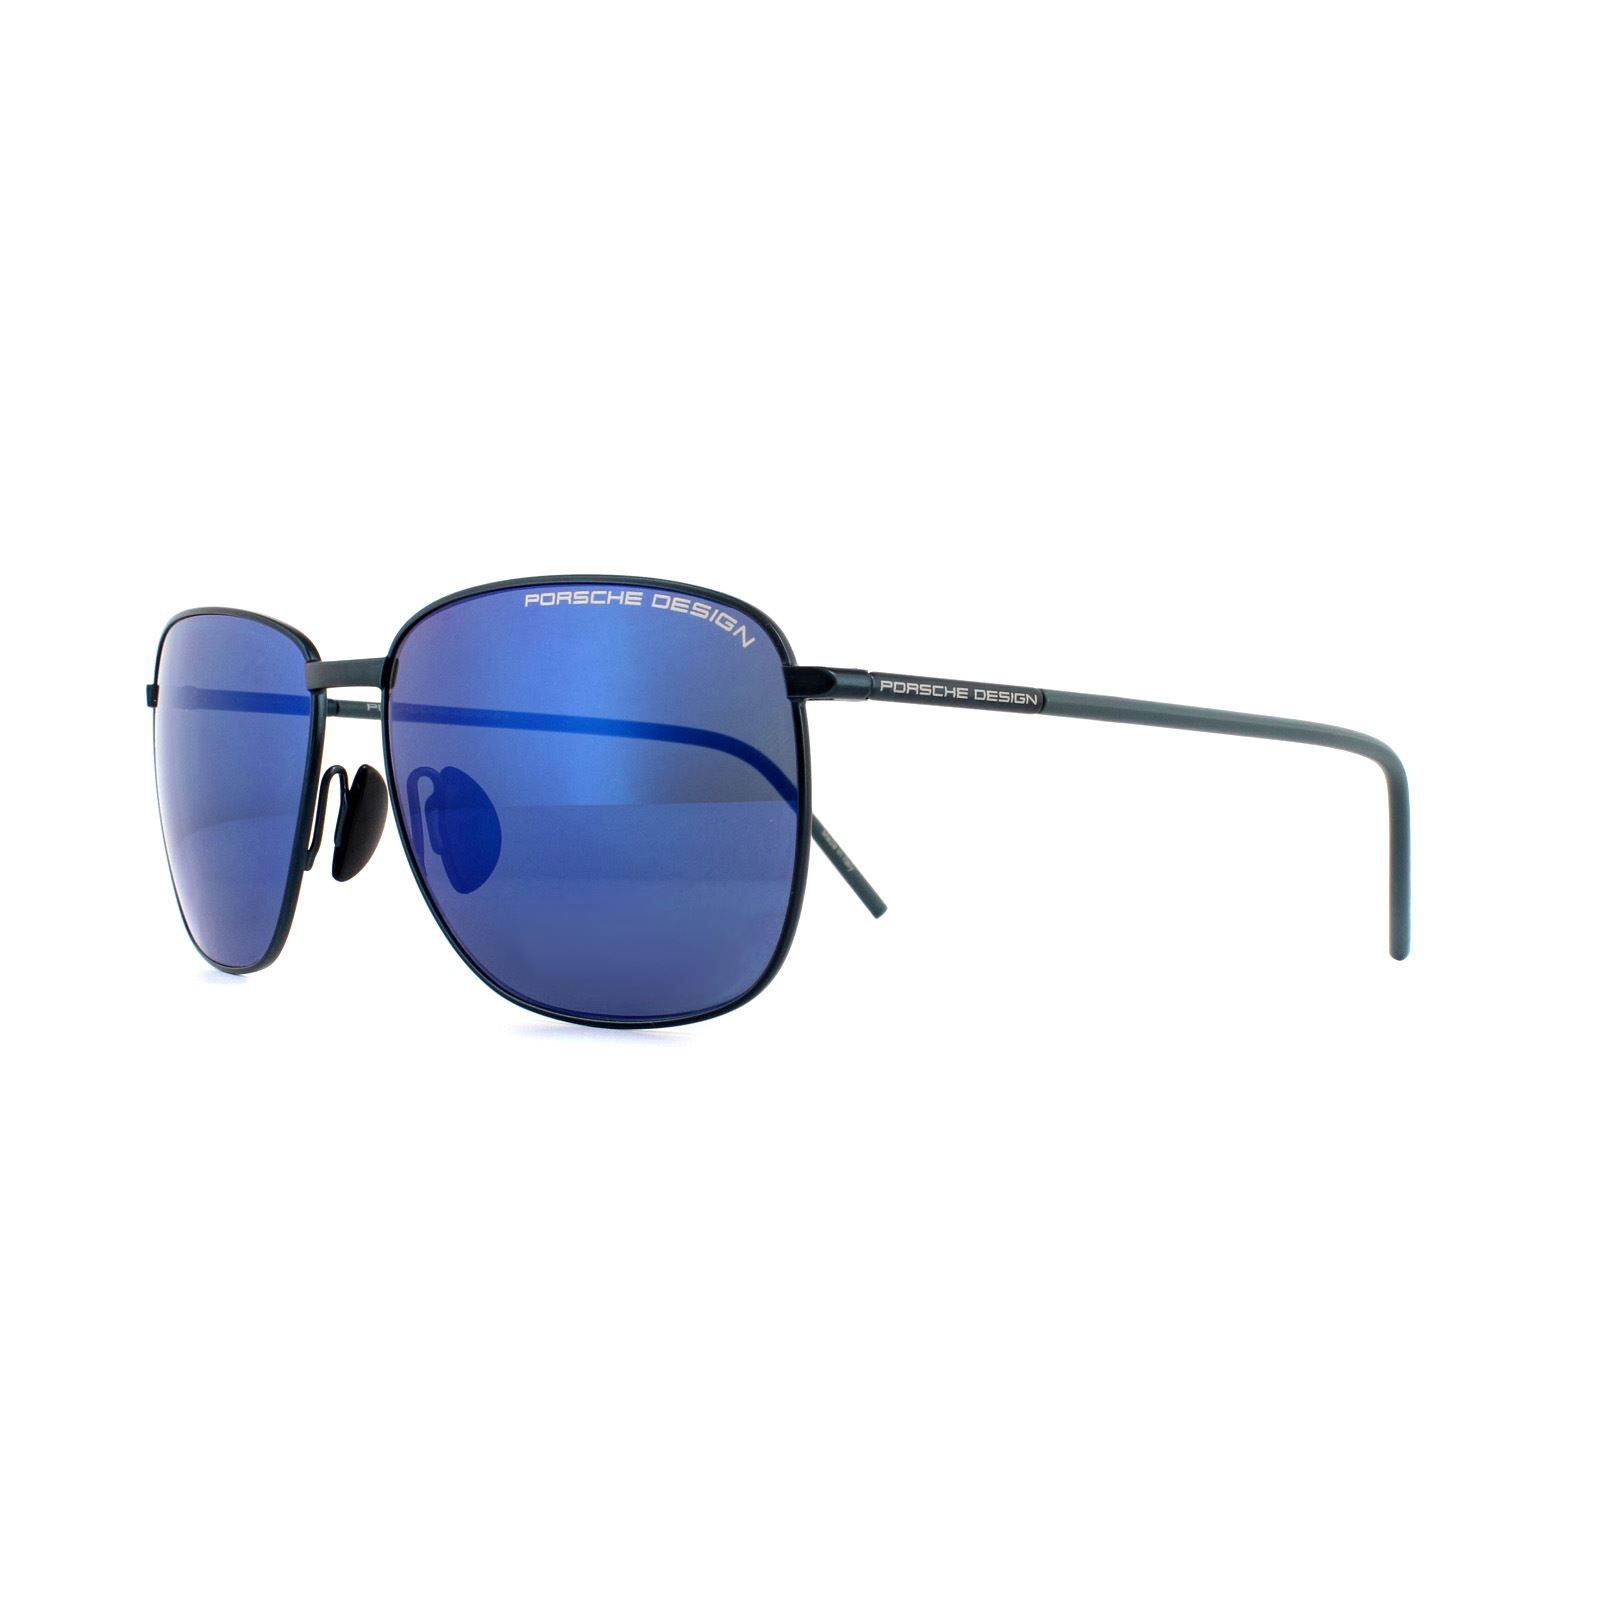 Porsche Design Sunglasses P8630 D Dark Blue Strong Dark Blue Mirror